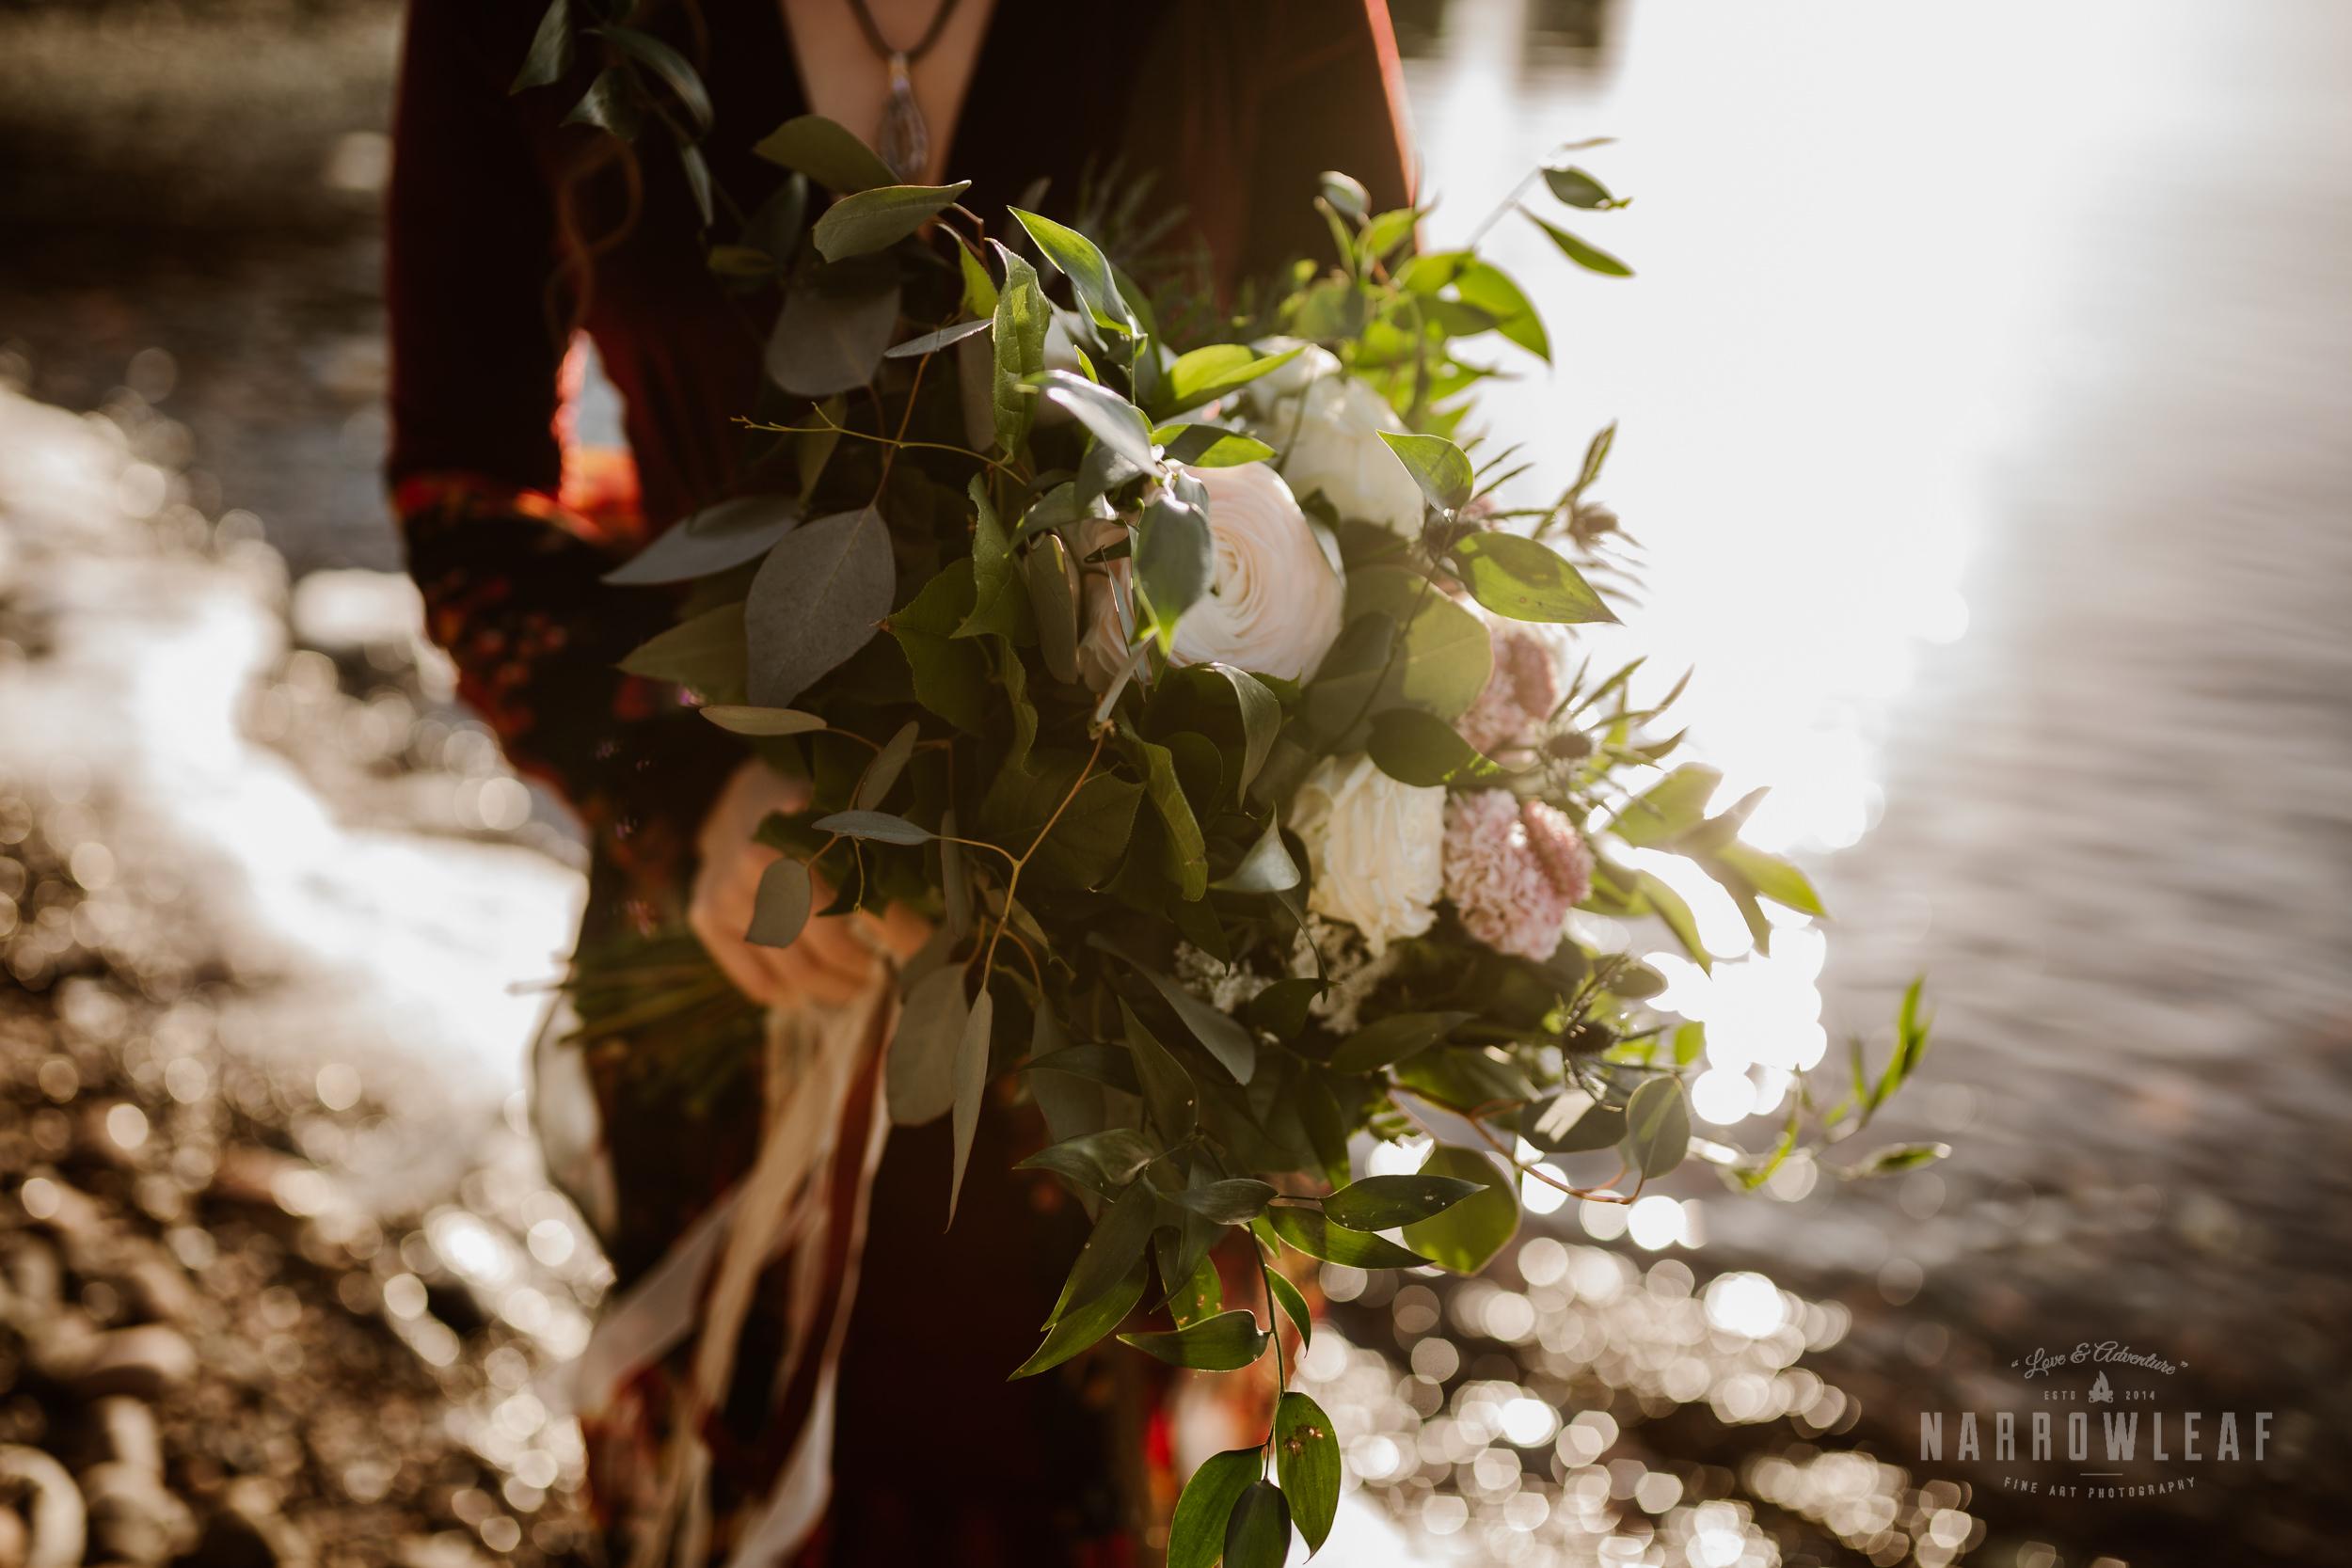 minnesota-adventure-elopement-Narrowleaf_Love_and_Adventure_Photography-9109.jpg